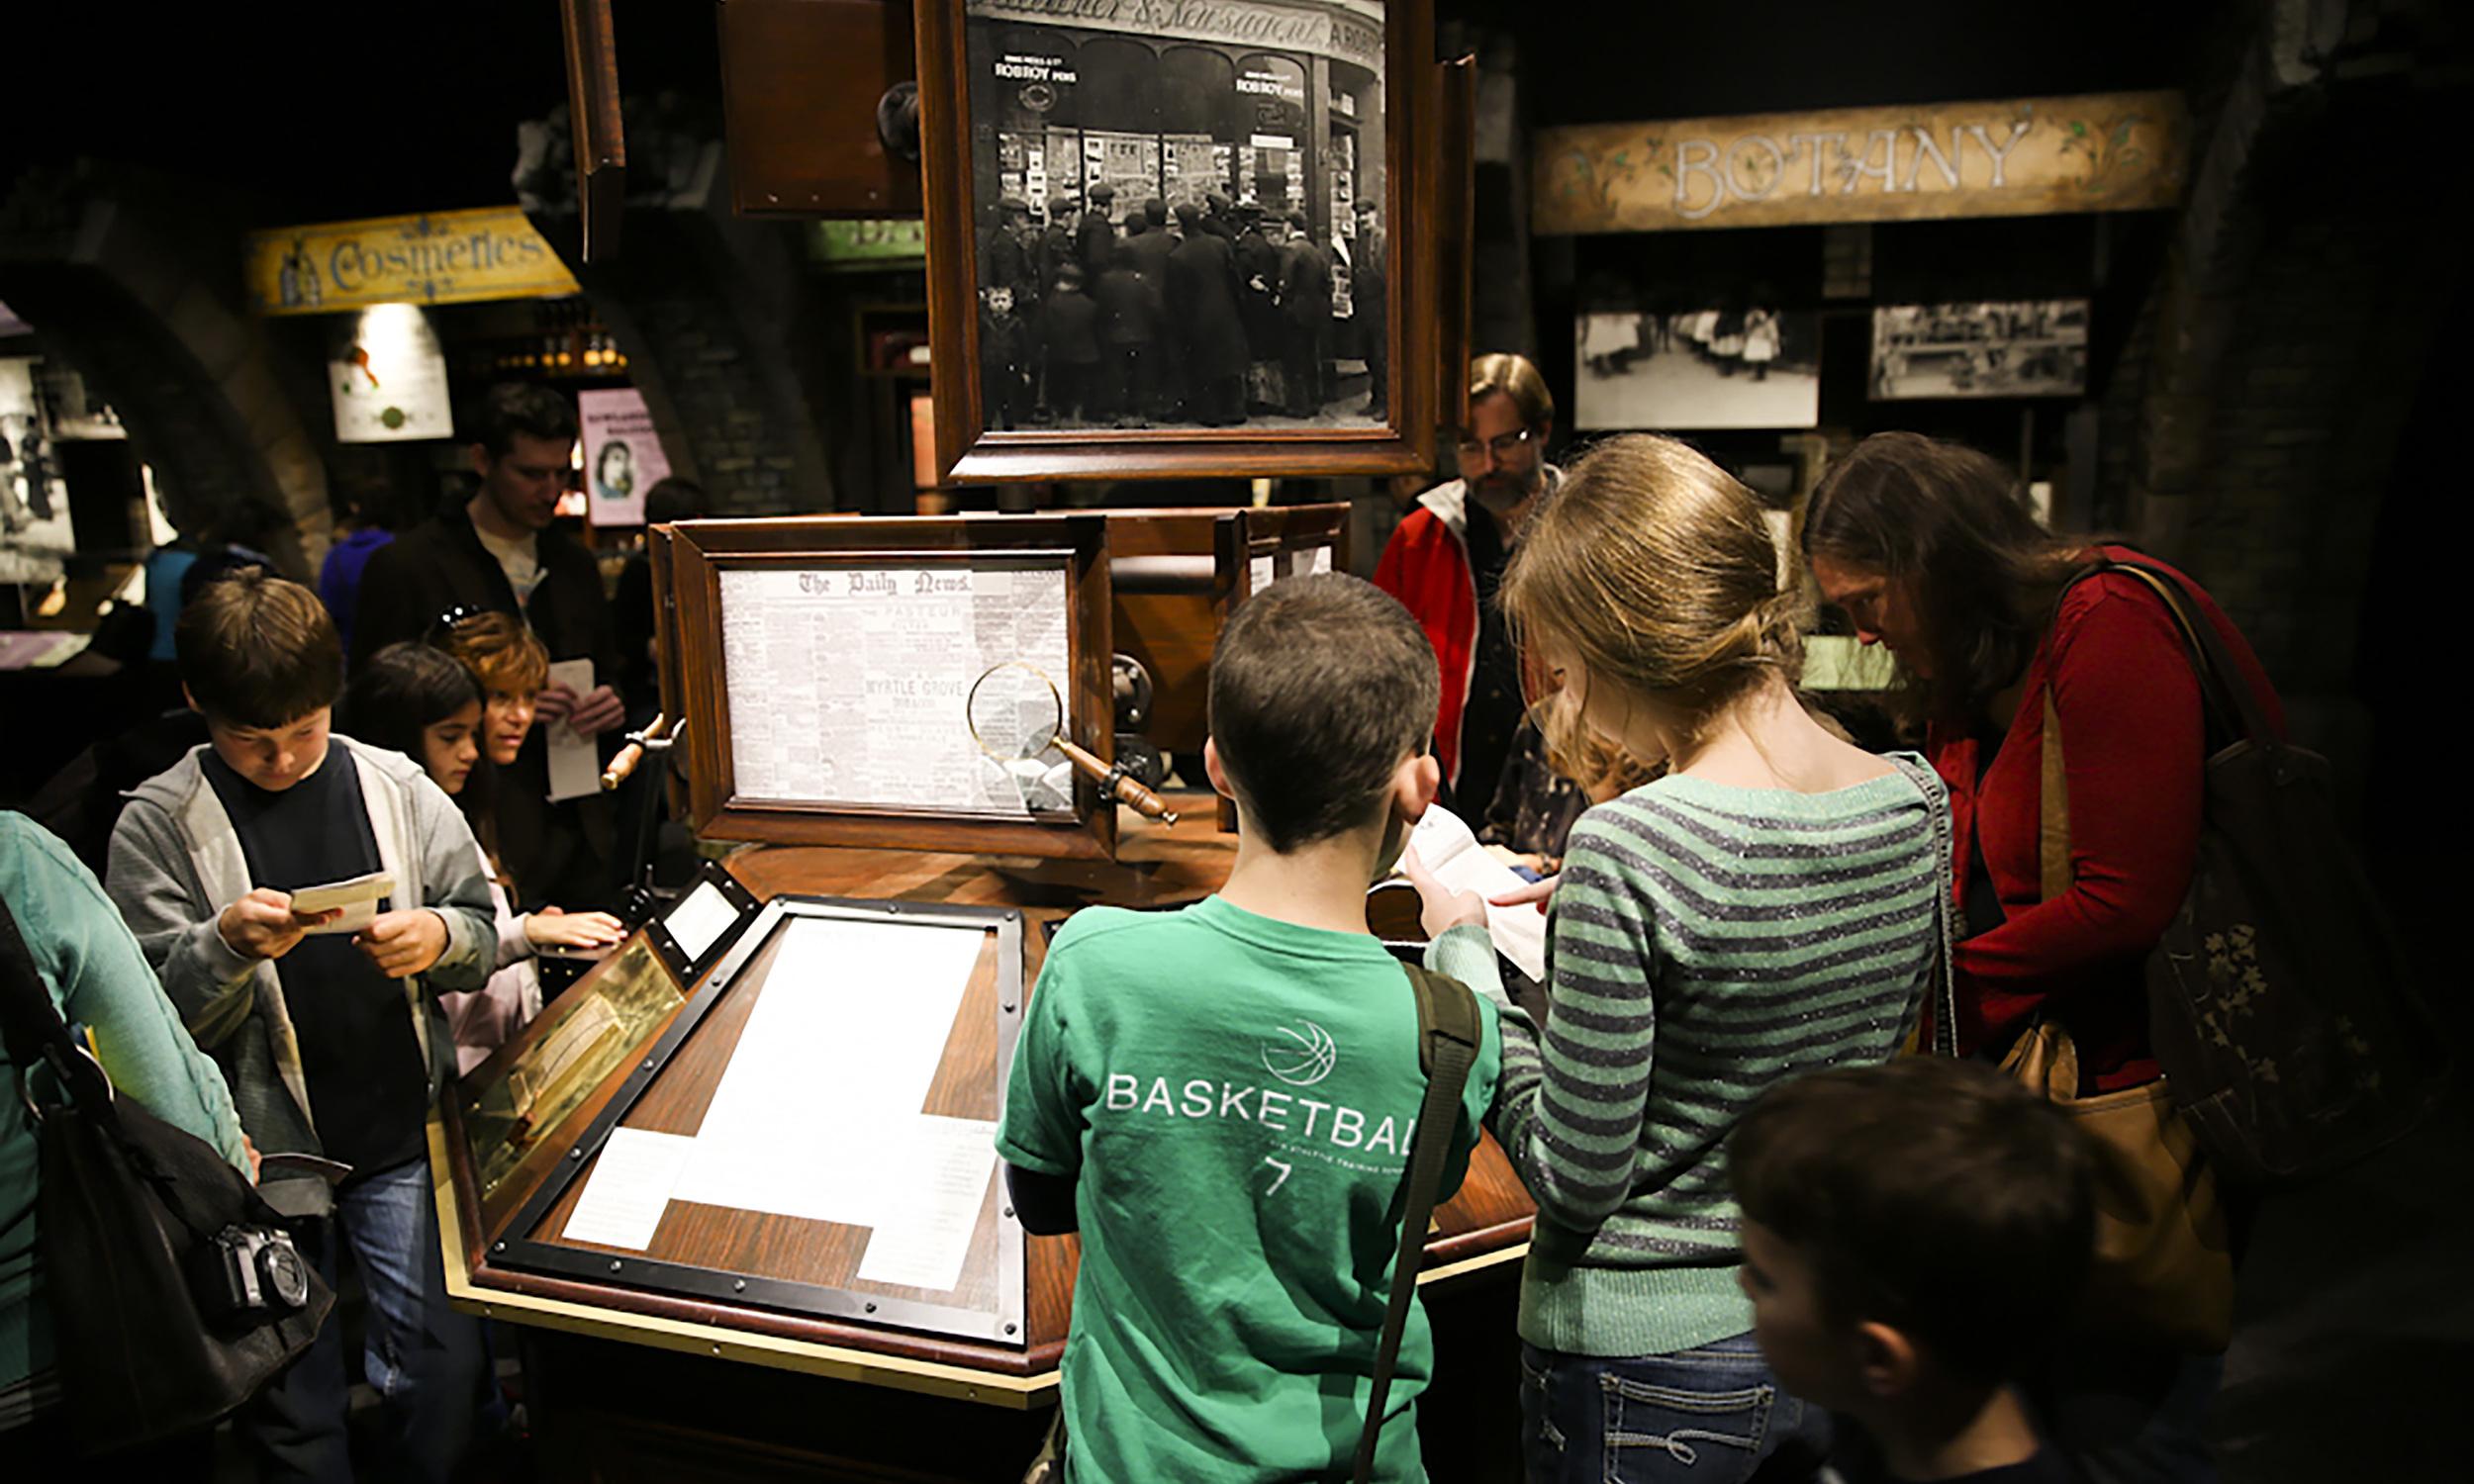 The International Exhibition of Sherlock Holmes